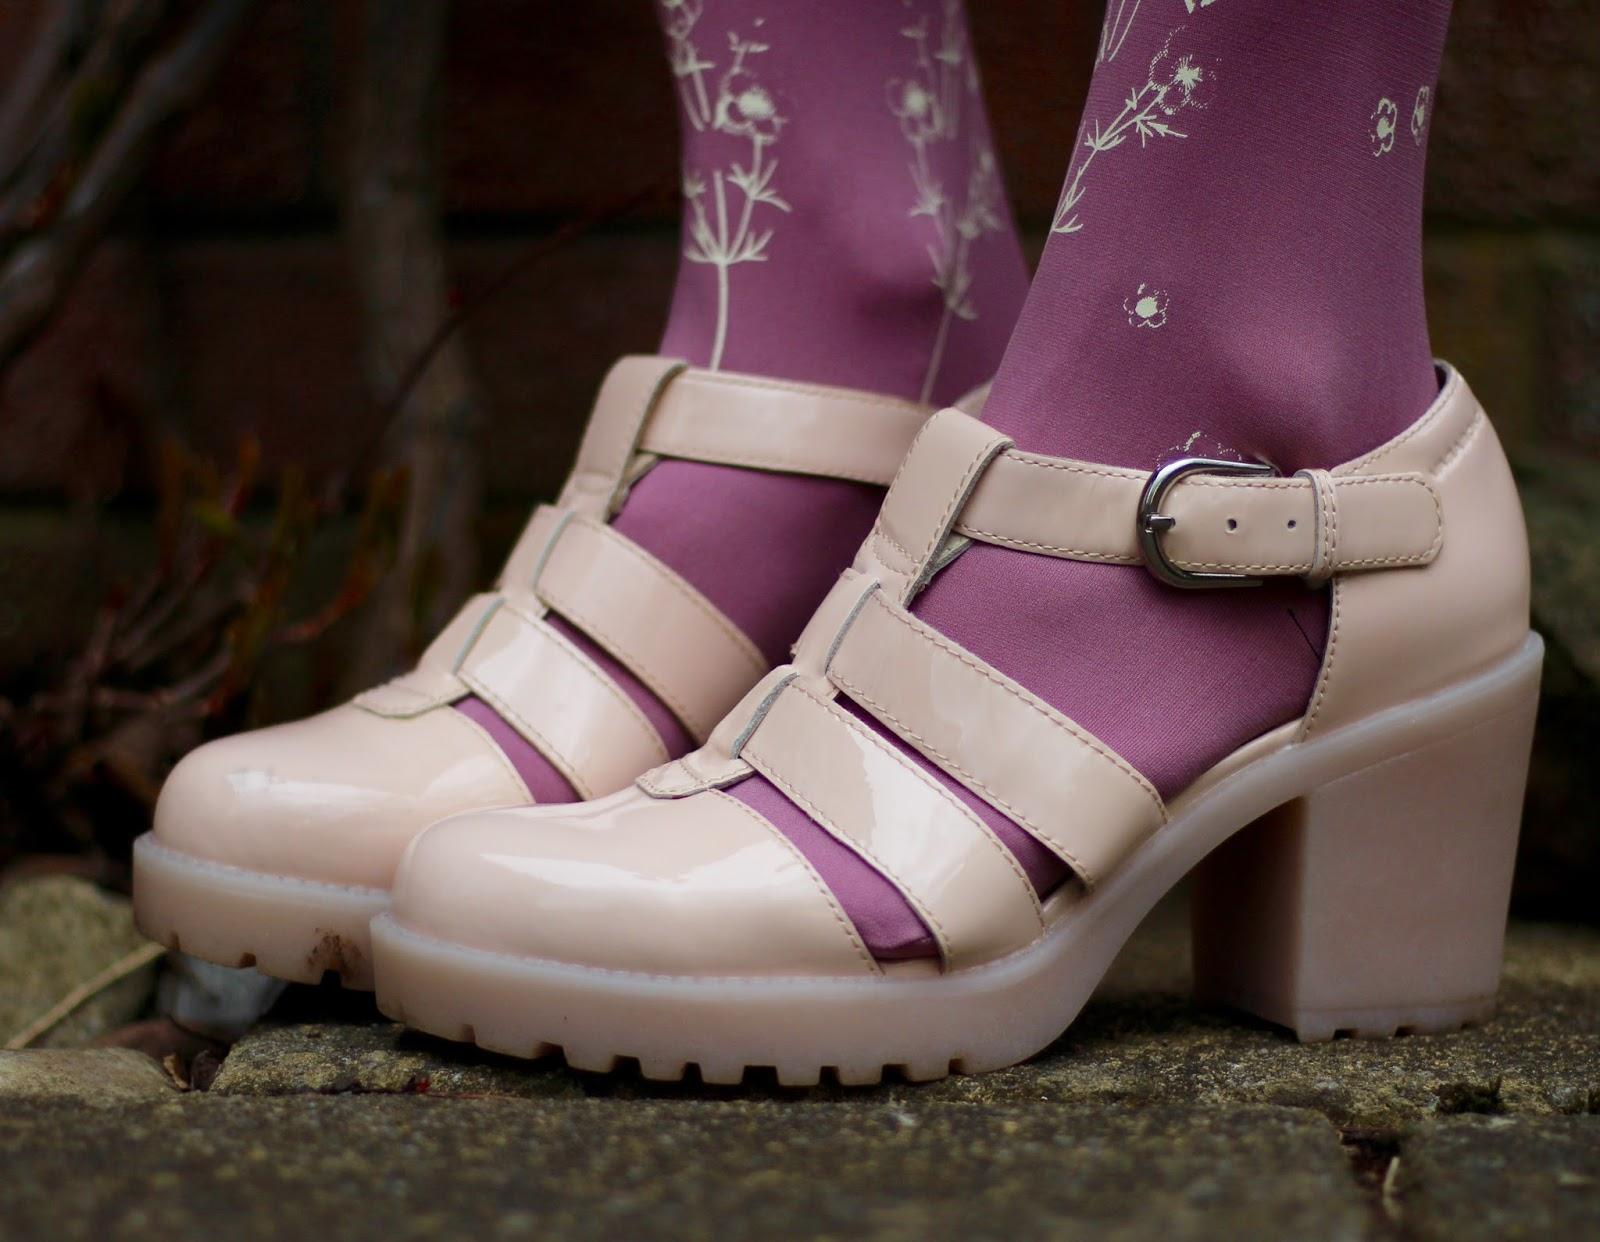 Zohara Patterned Tights and vagabond sandals.